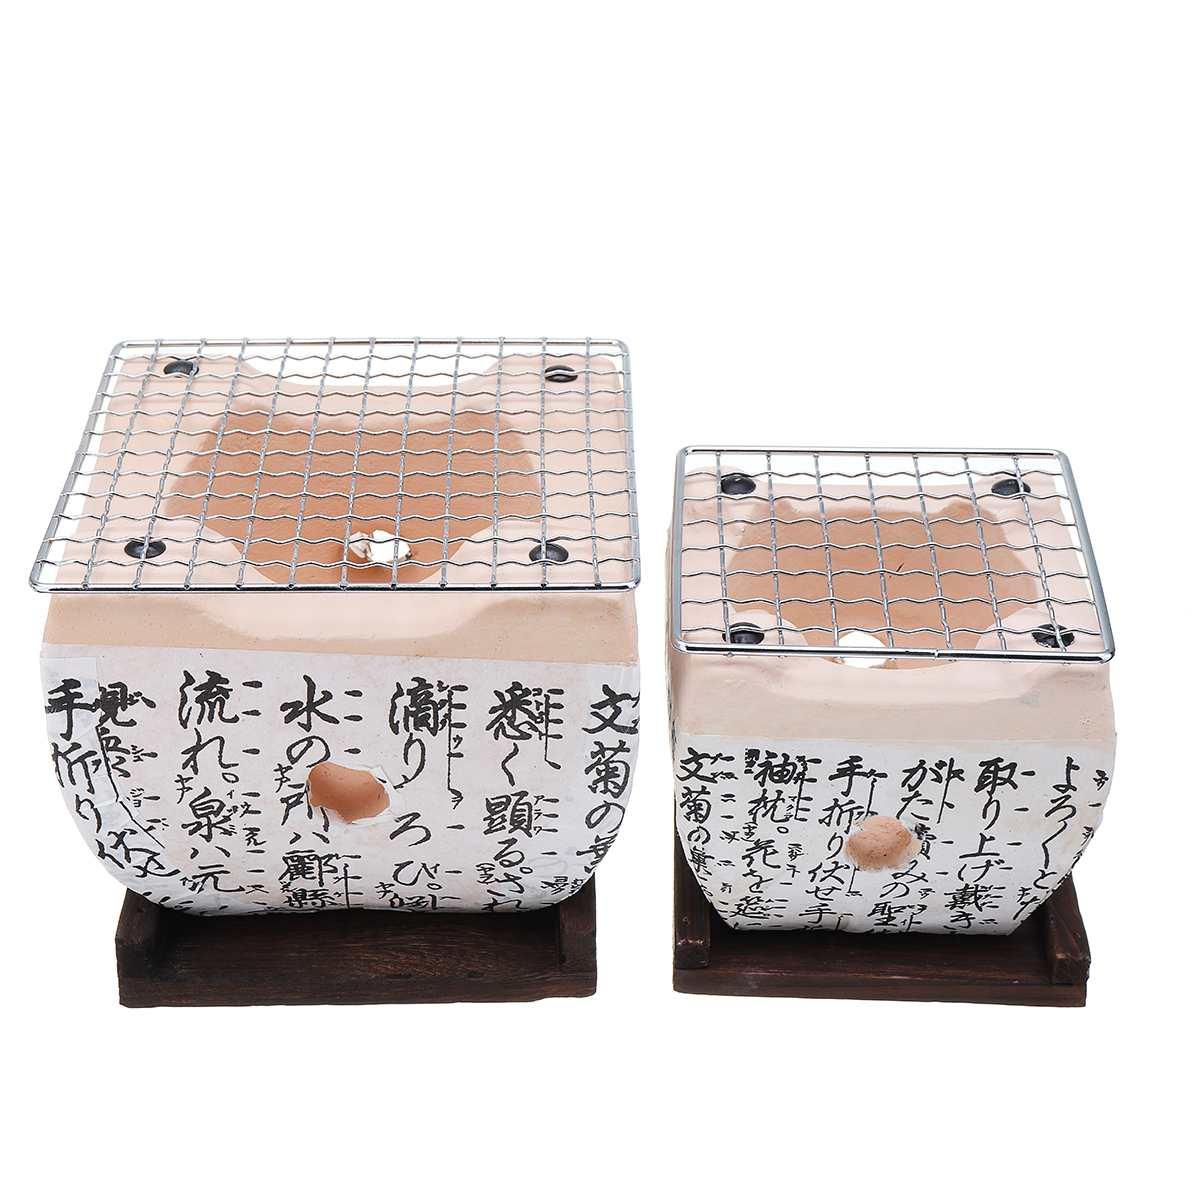 New Japanese Korean Style BBQ Grill Charcoal Stove Konro Ceramic Hibachi Yakitori Camping Barbecue BBQ Accessories Tools 2 Sizes